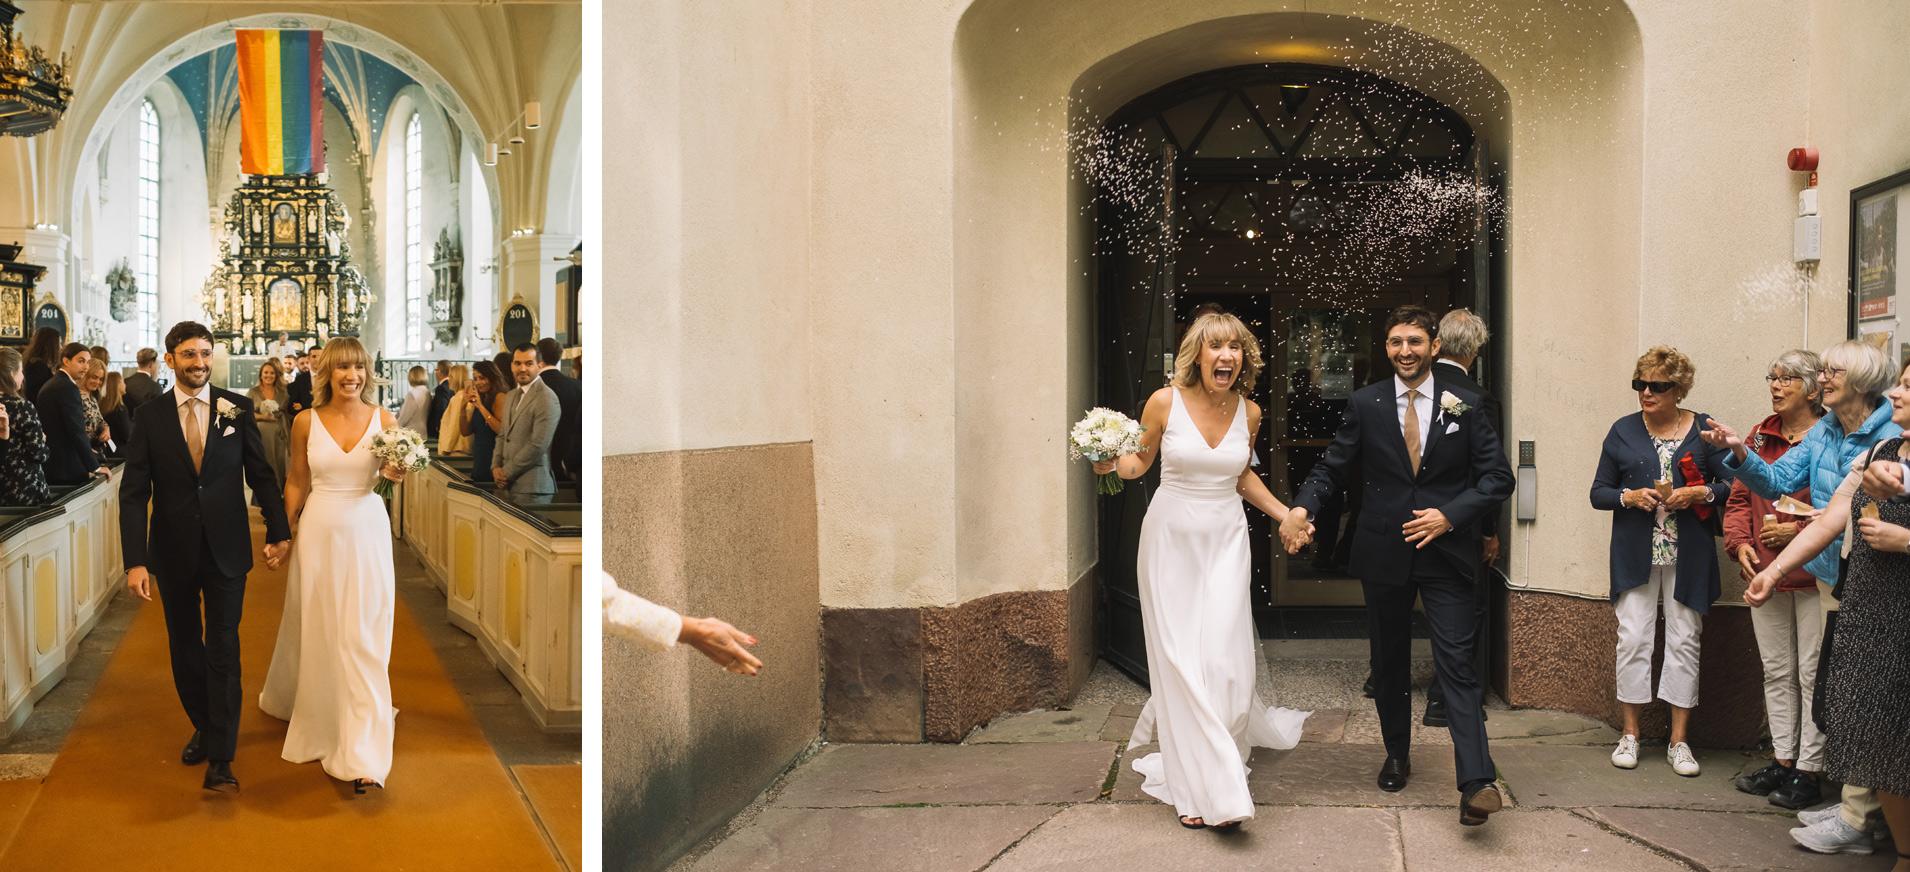 Bröllop Kyrkans Hus Gävle